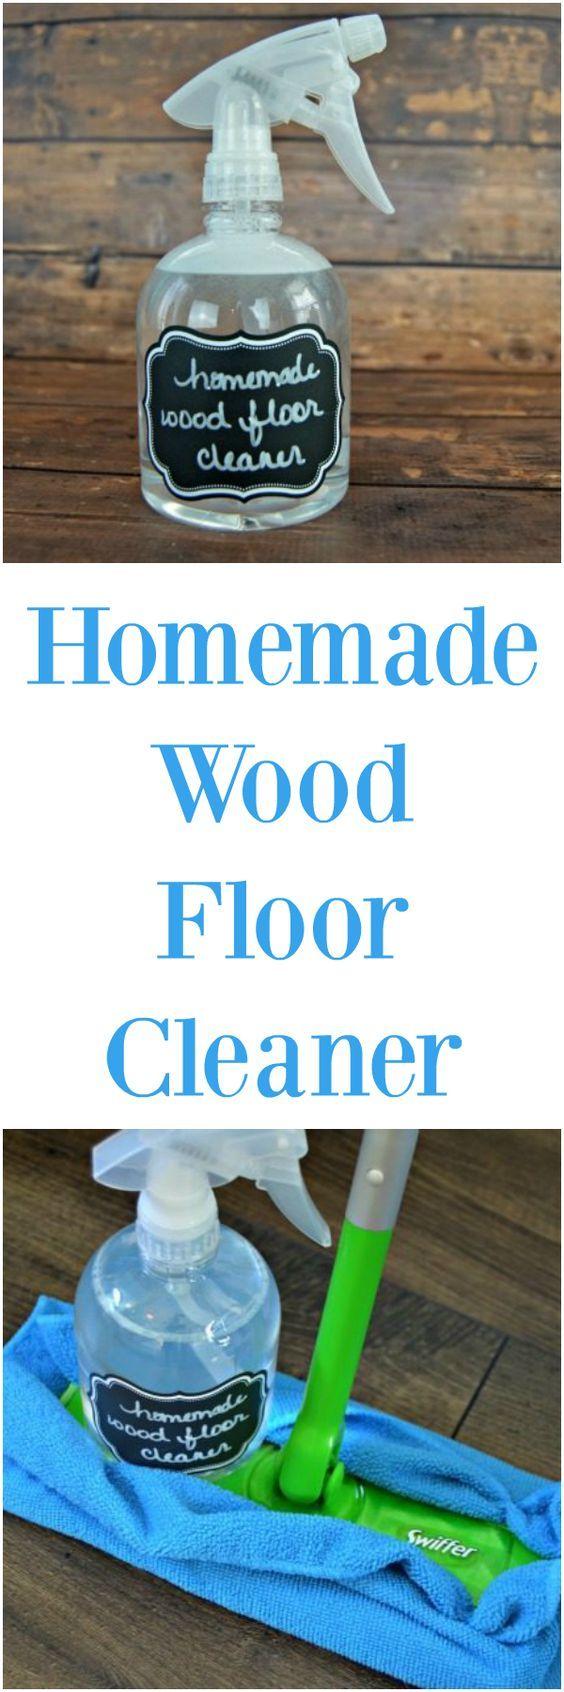 Easy Homemade Wood Floor Cleaner Homemade wood floor